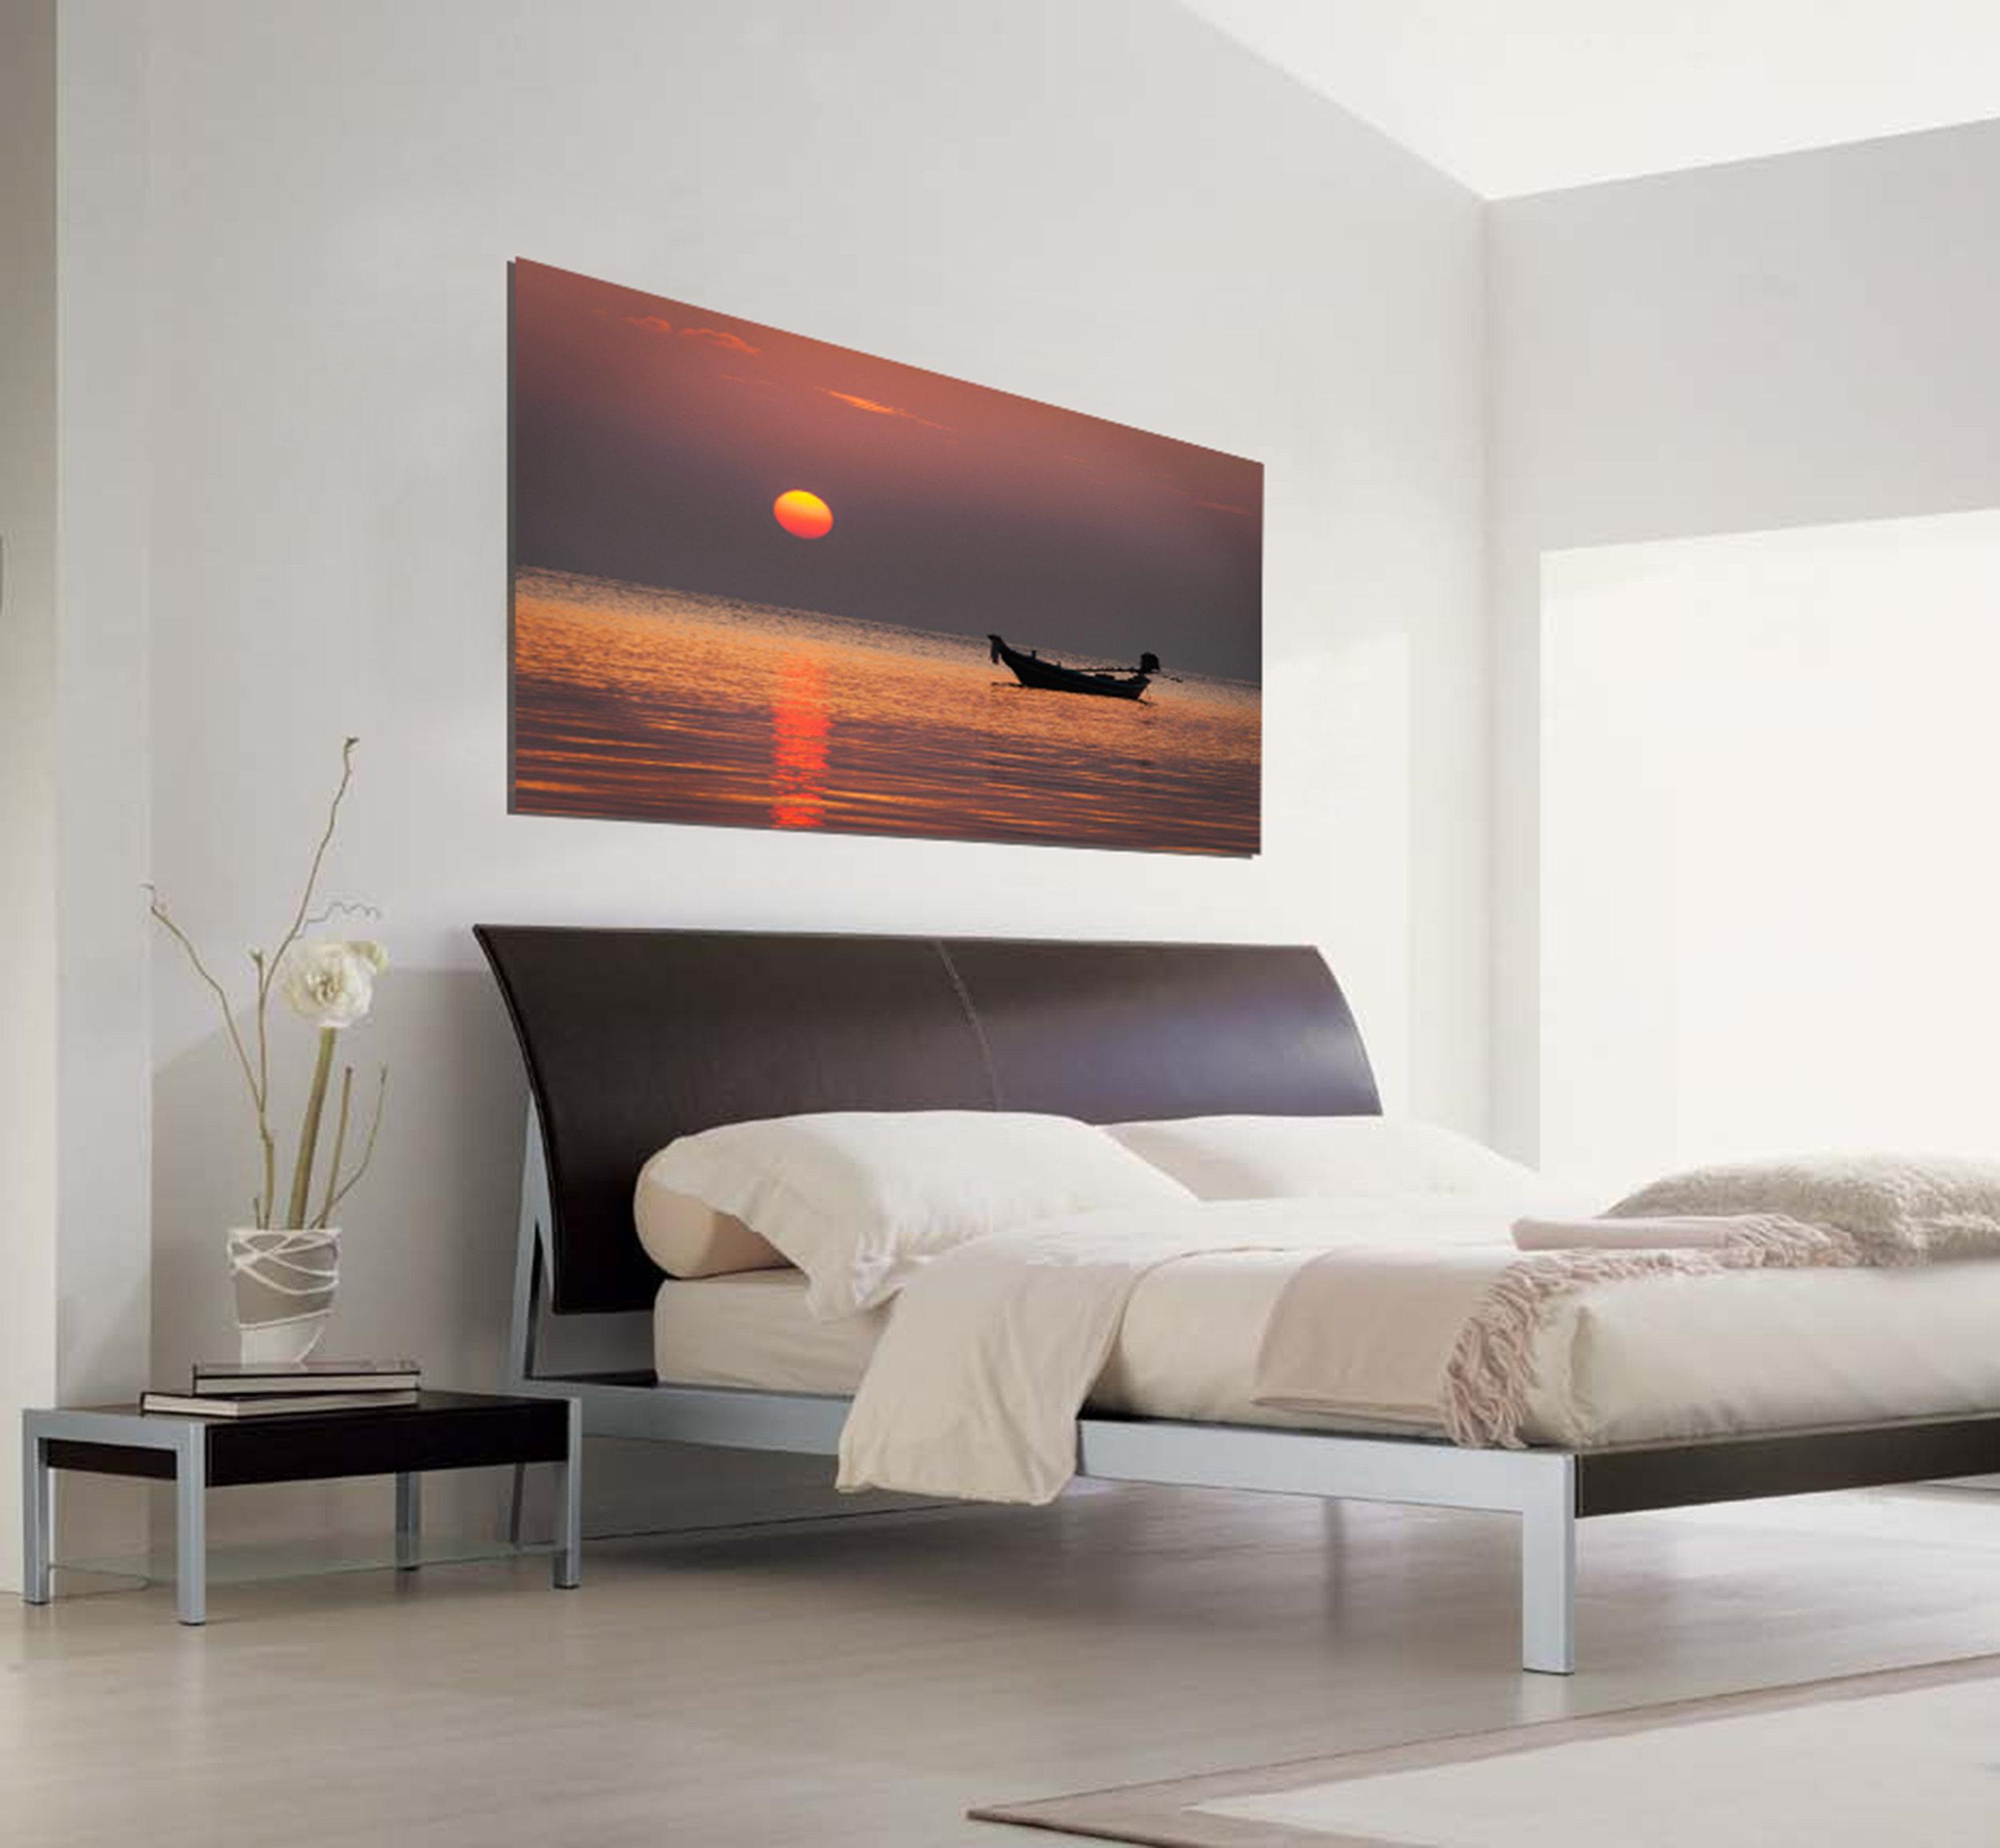 RE_thailand_bedroom.jpg